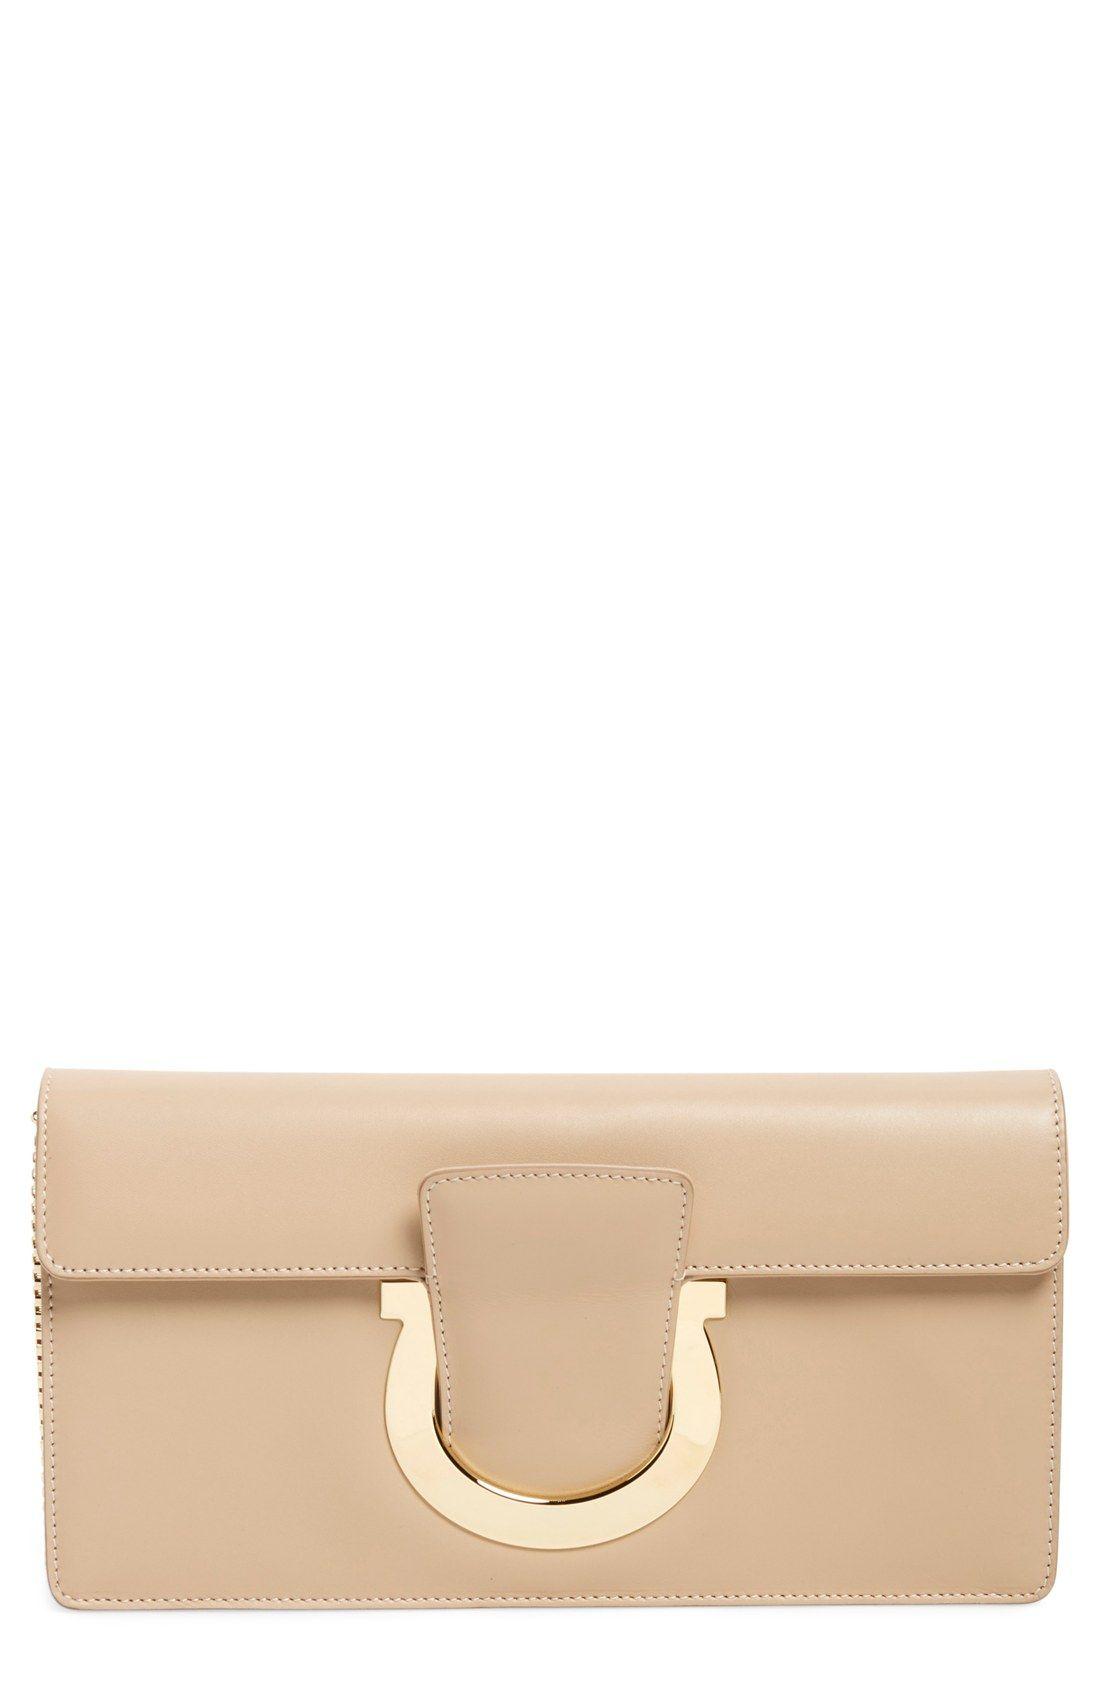 Salvatore Ferragamo 'Thalia' Leather Shoulder Bag